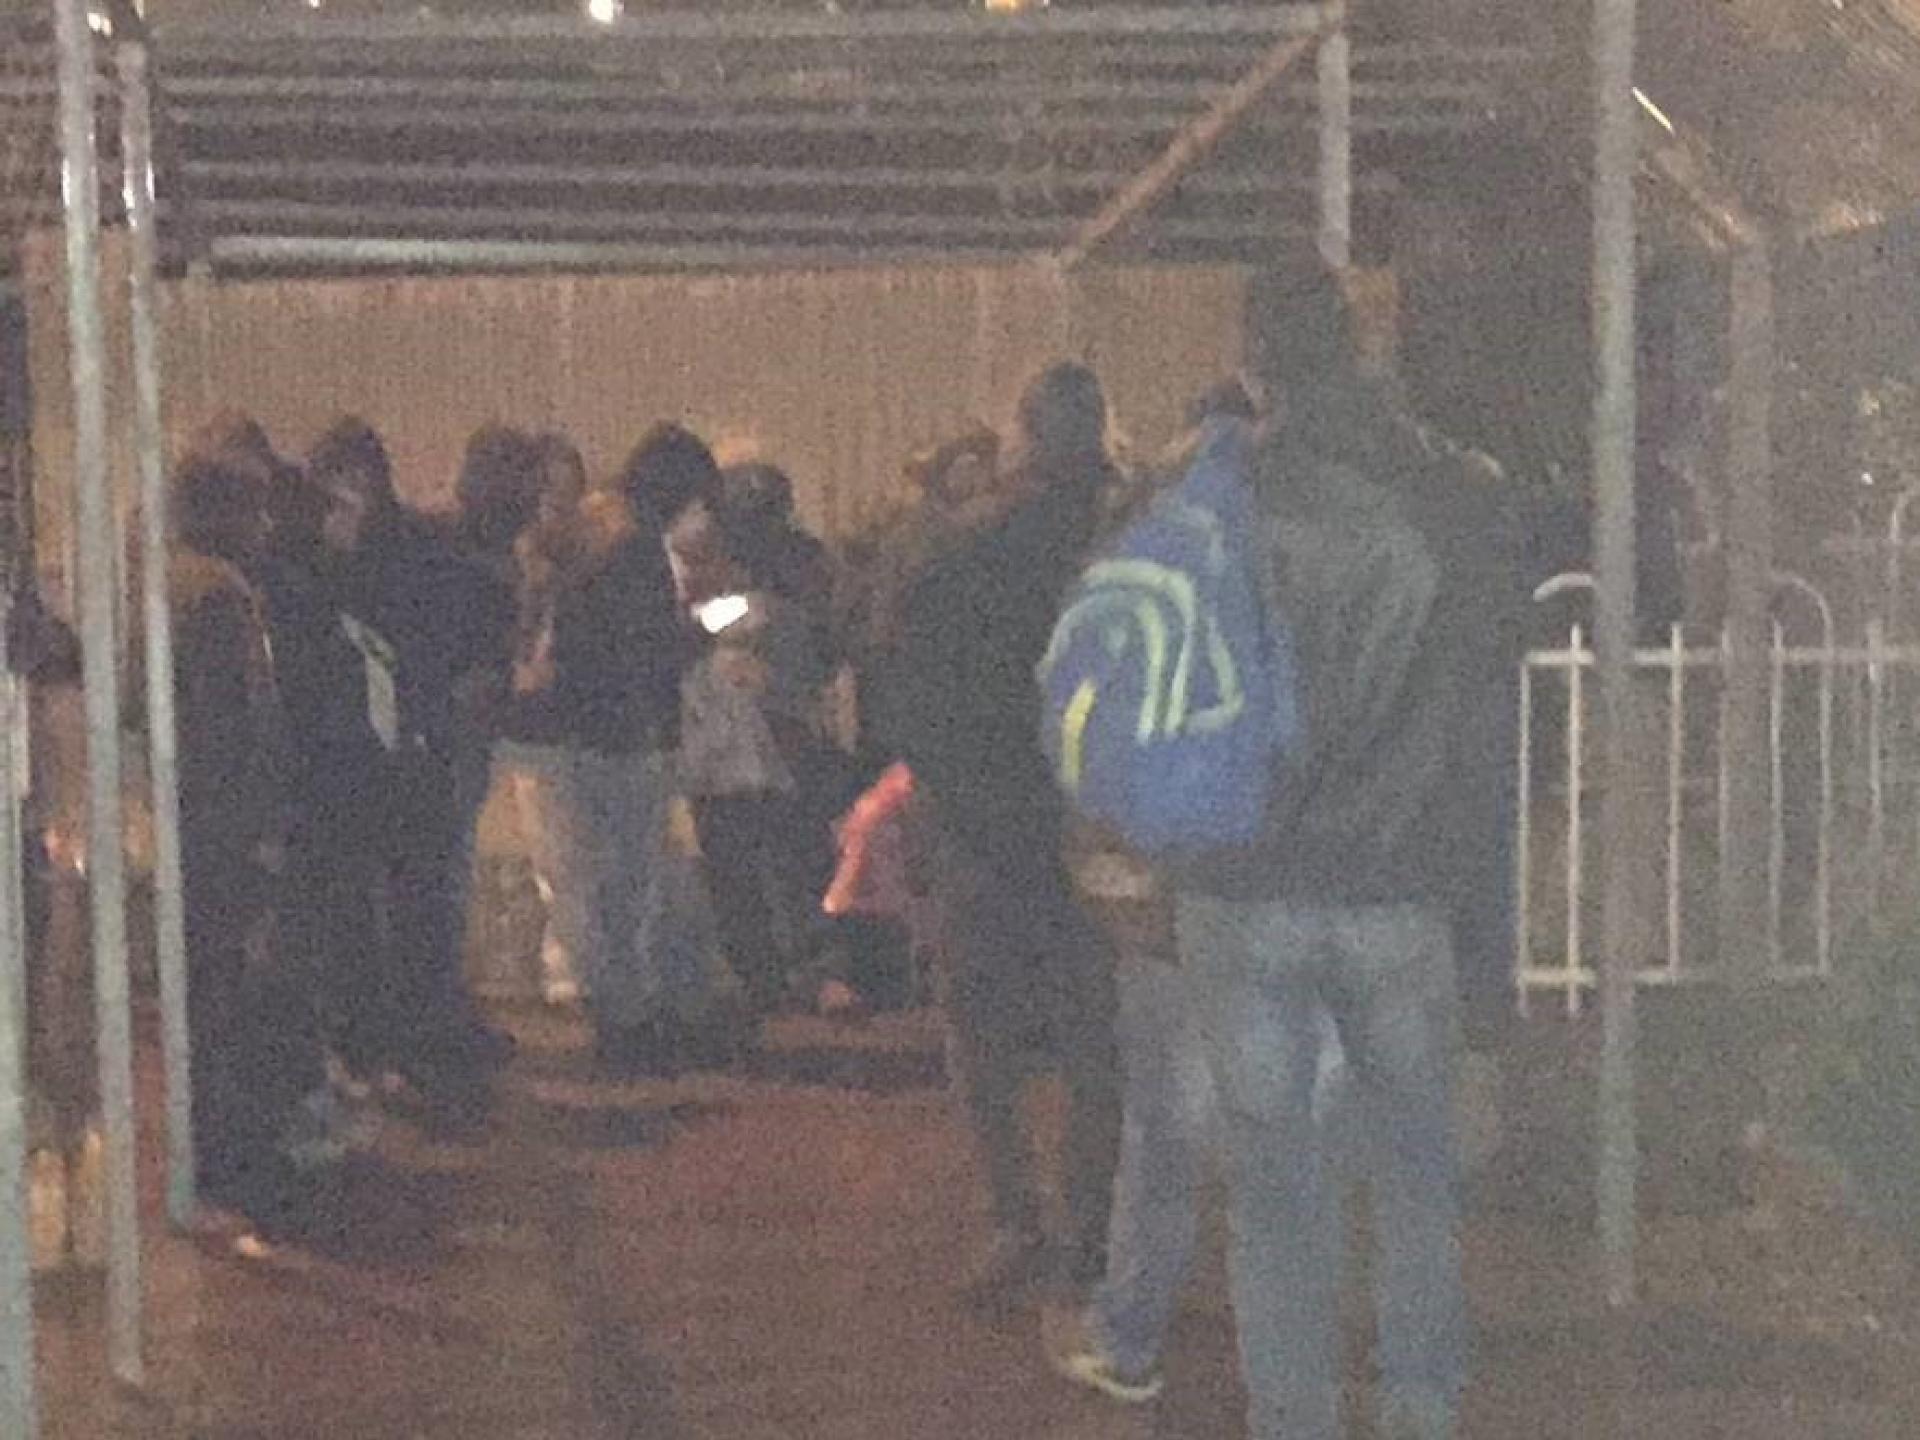 Bethlehem c.p: People hiding from the rain